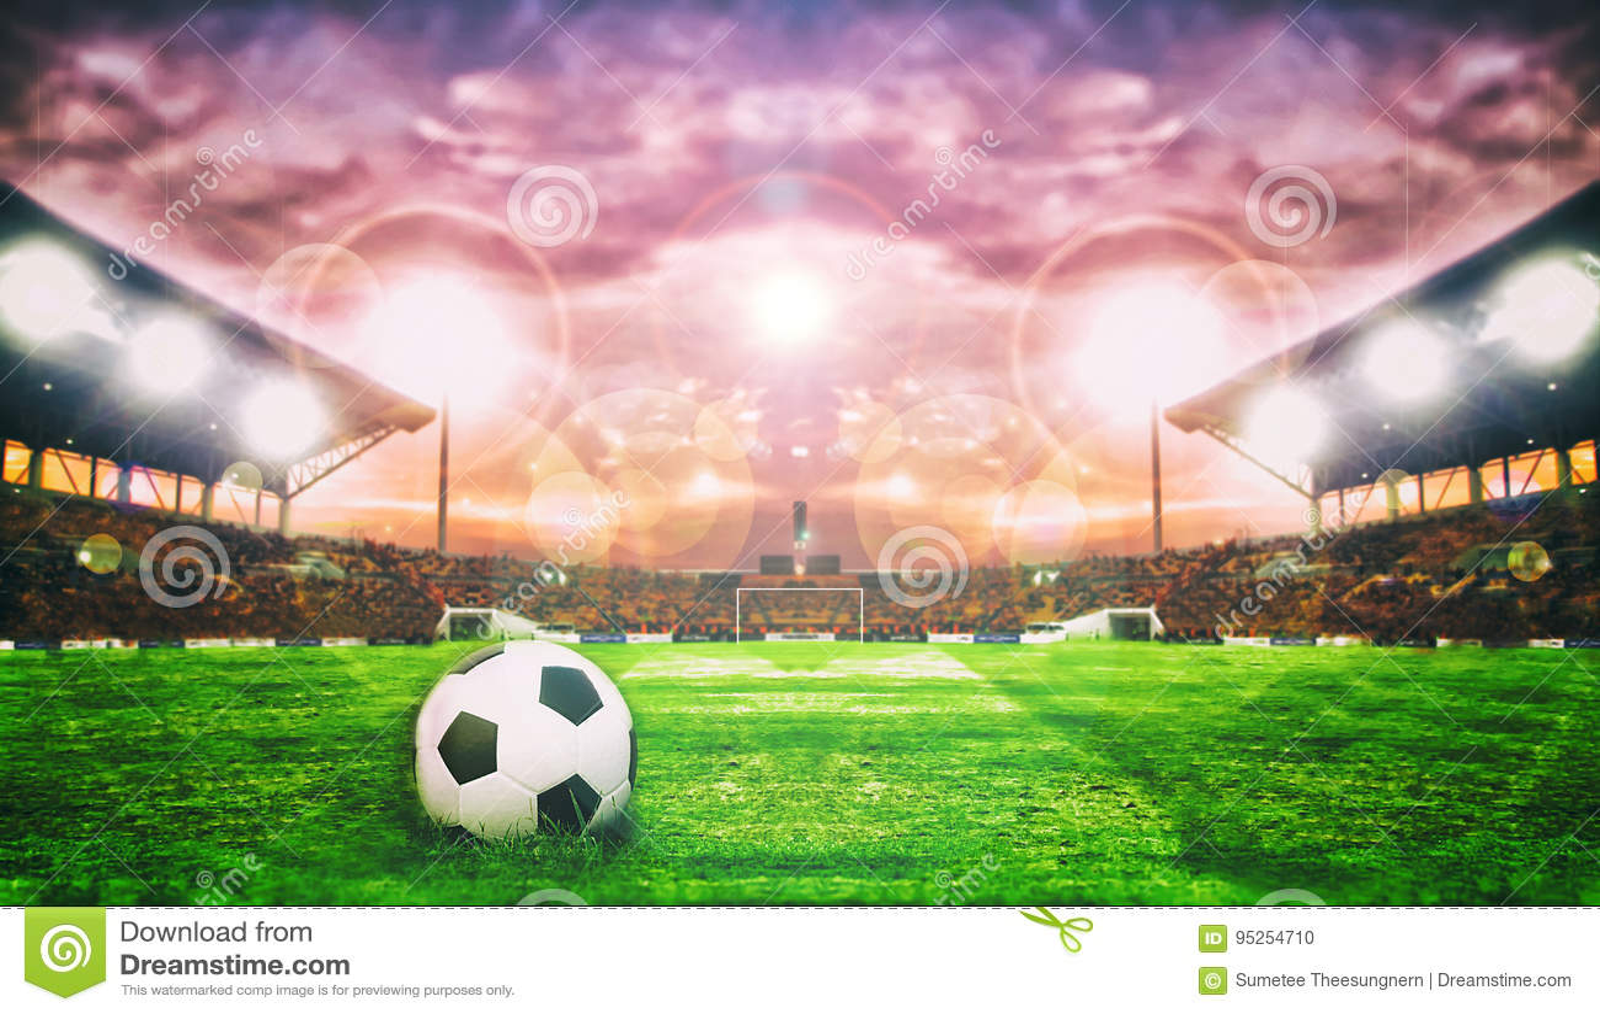 Soccer Ball On Green Field of football stadium for background